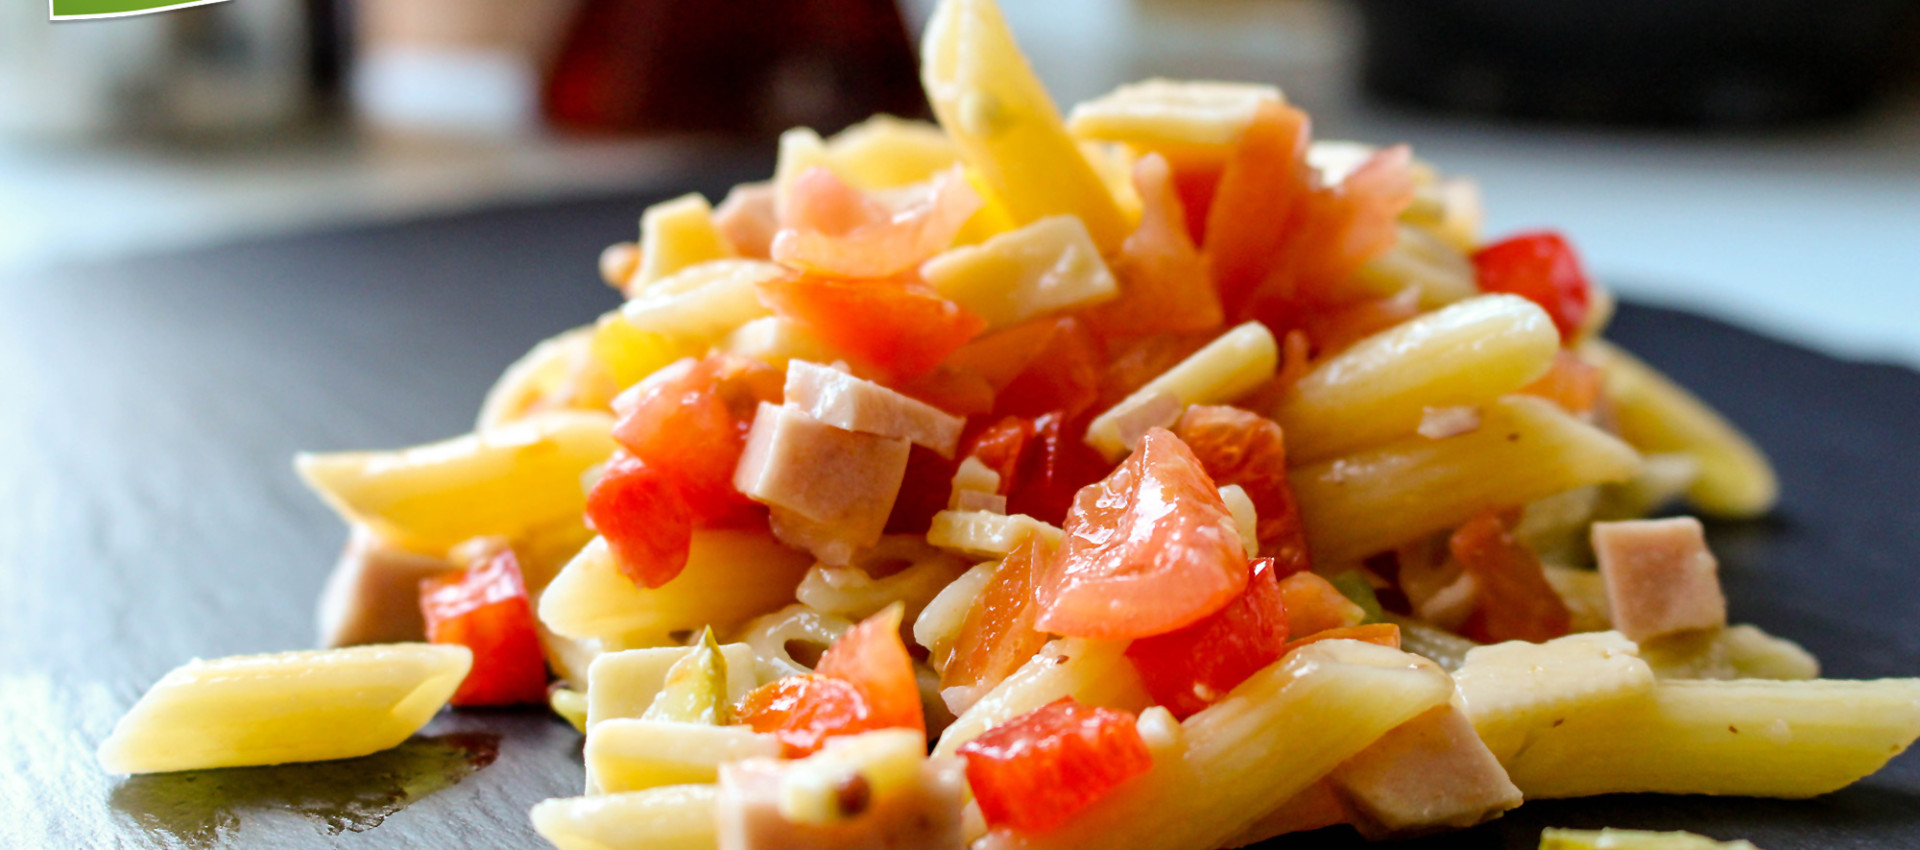 Rezept bayerischer Nudelsalat mit Wurst & Käse - KochBock.de